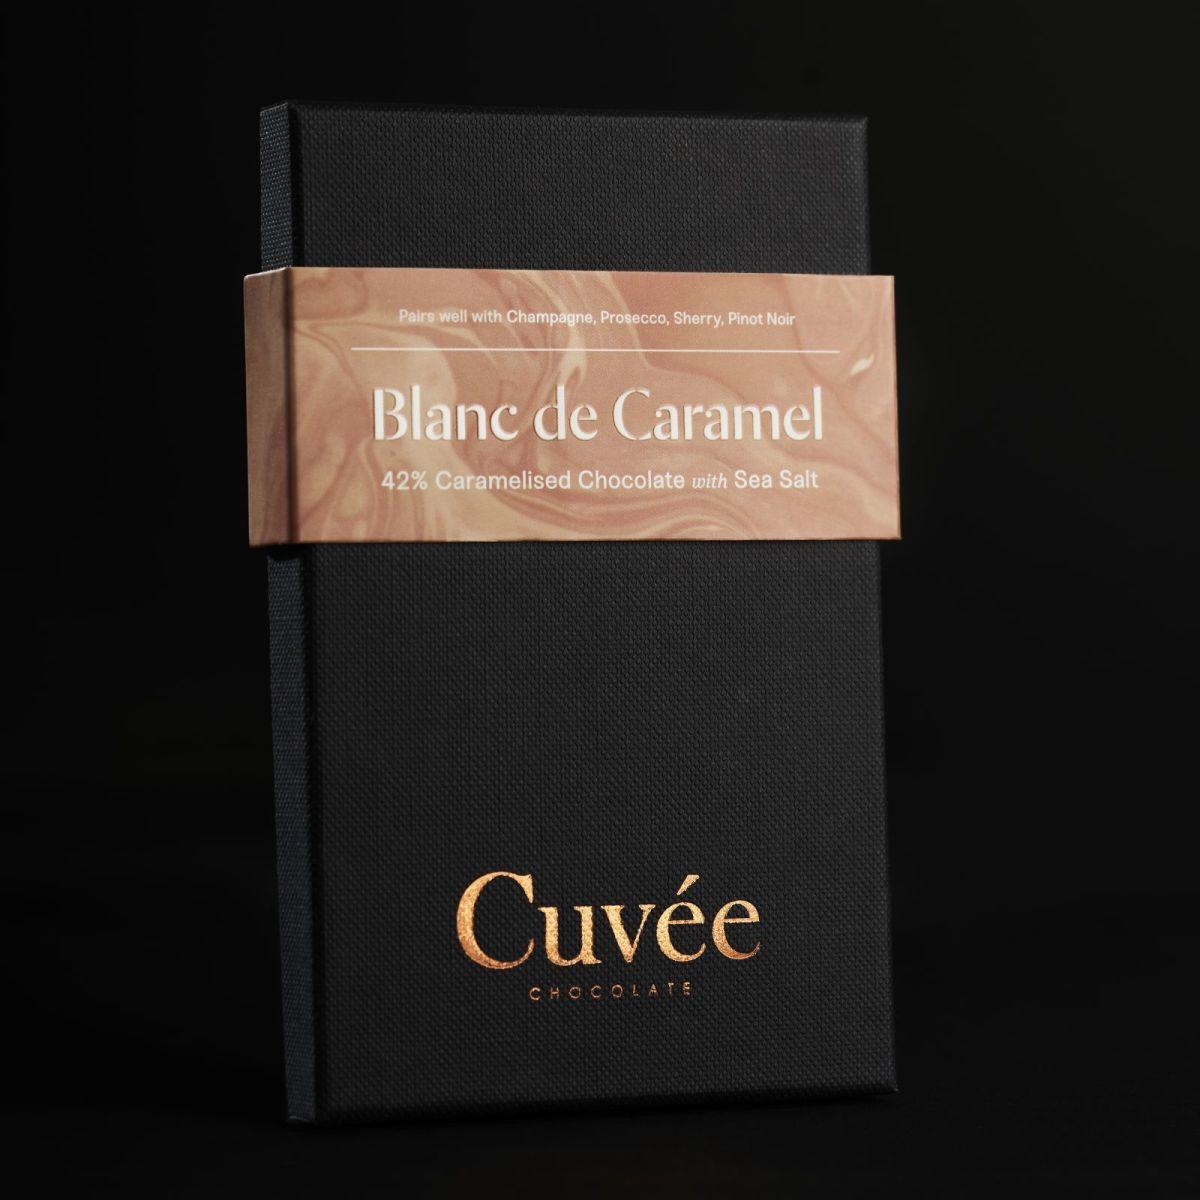 Cuvée Chocolate - Blanc de Caramel 42% Caramel Choc.